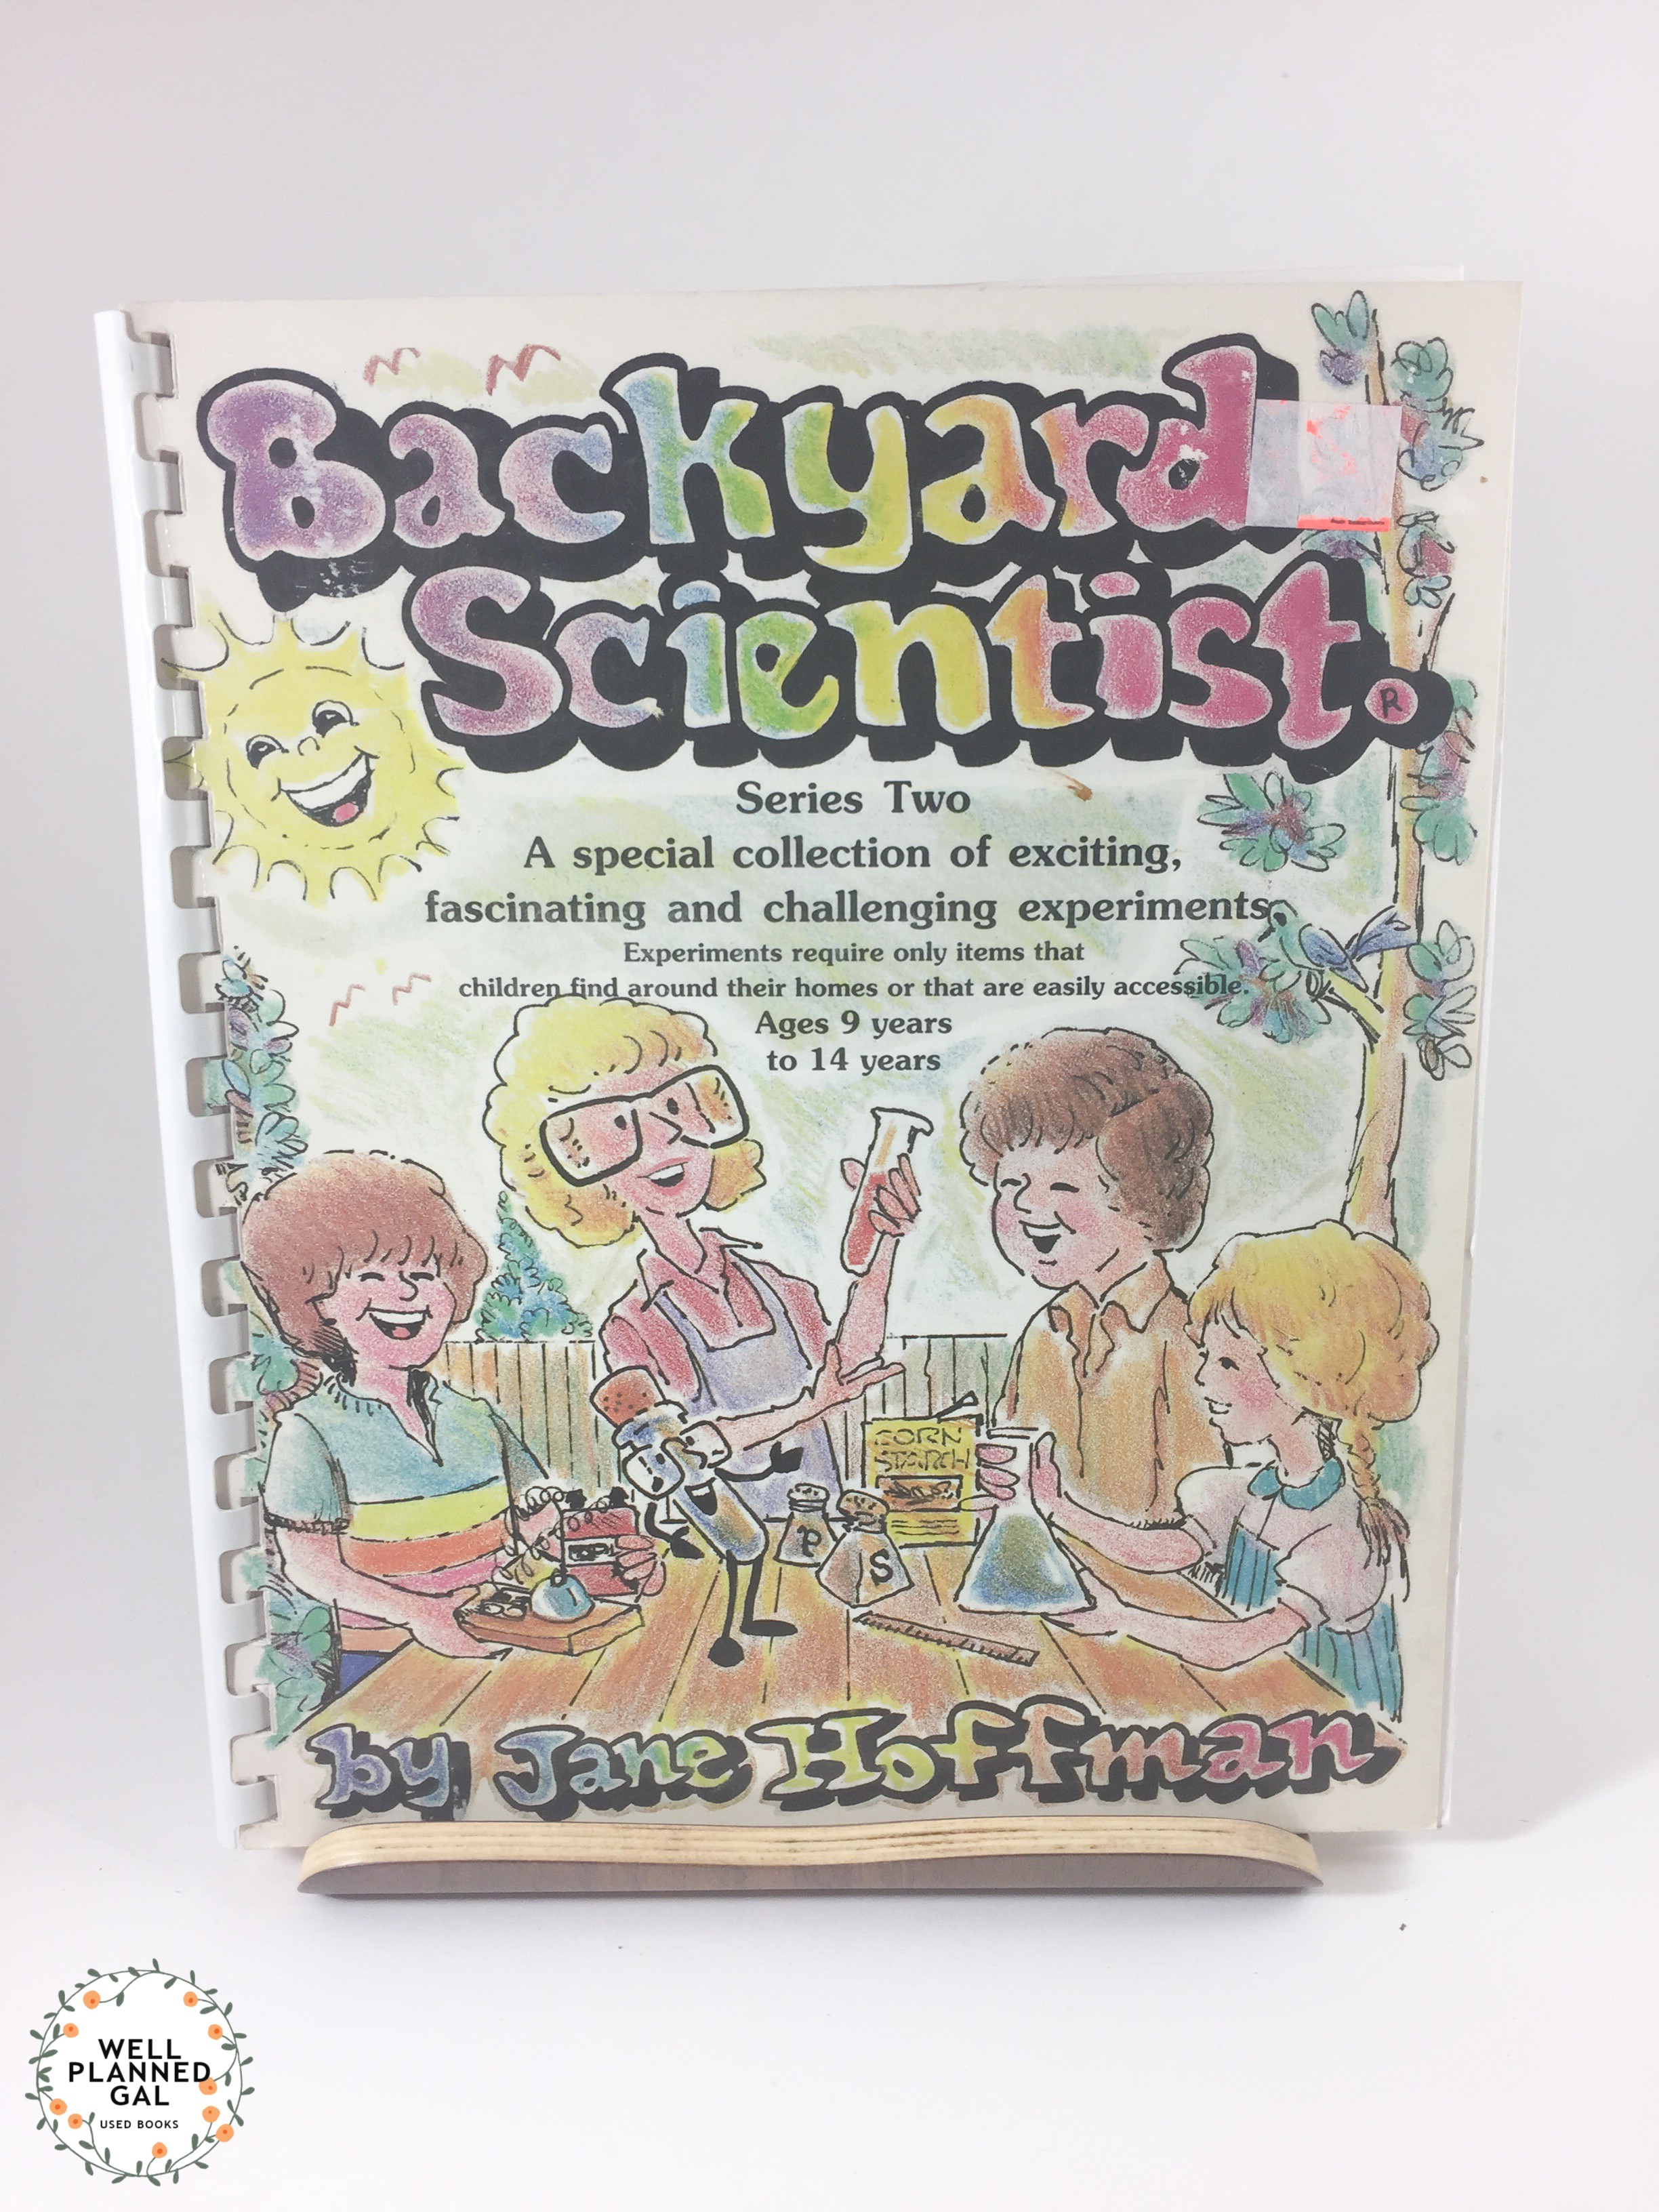 Backyard Scientist Series backyard scientist series 2: ages 9-14